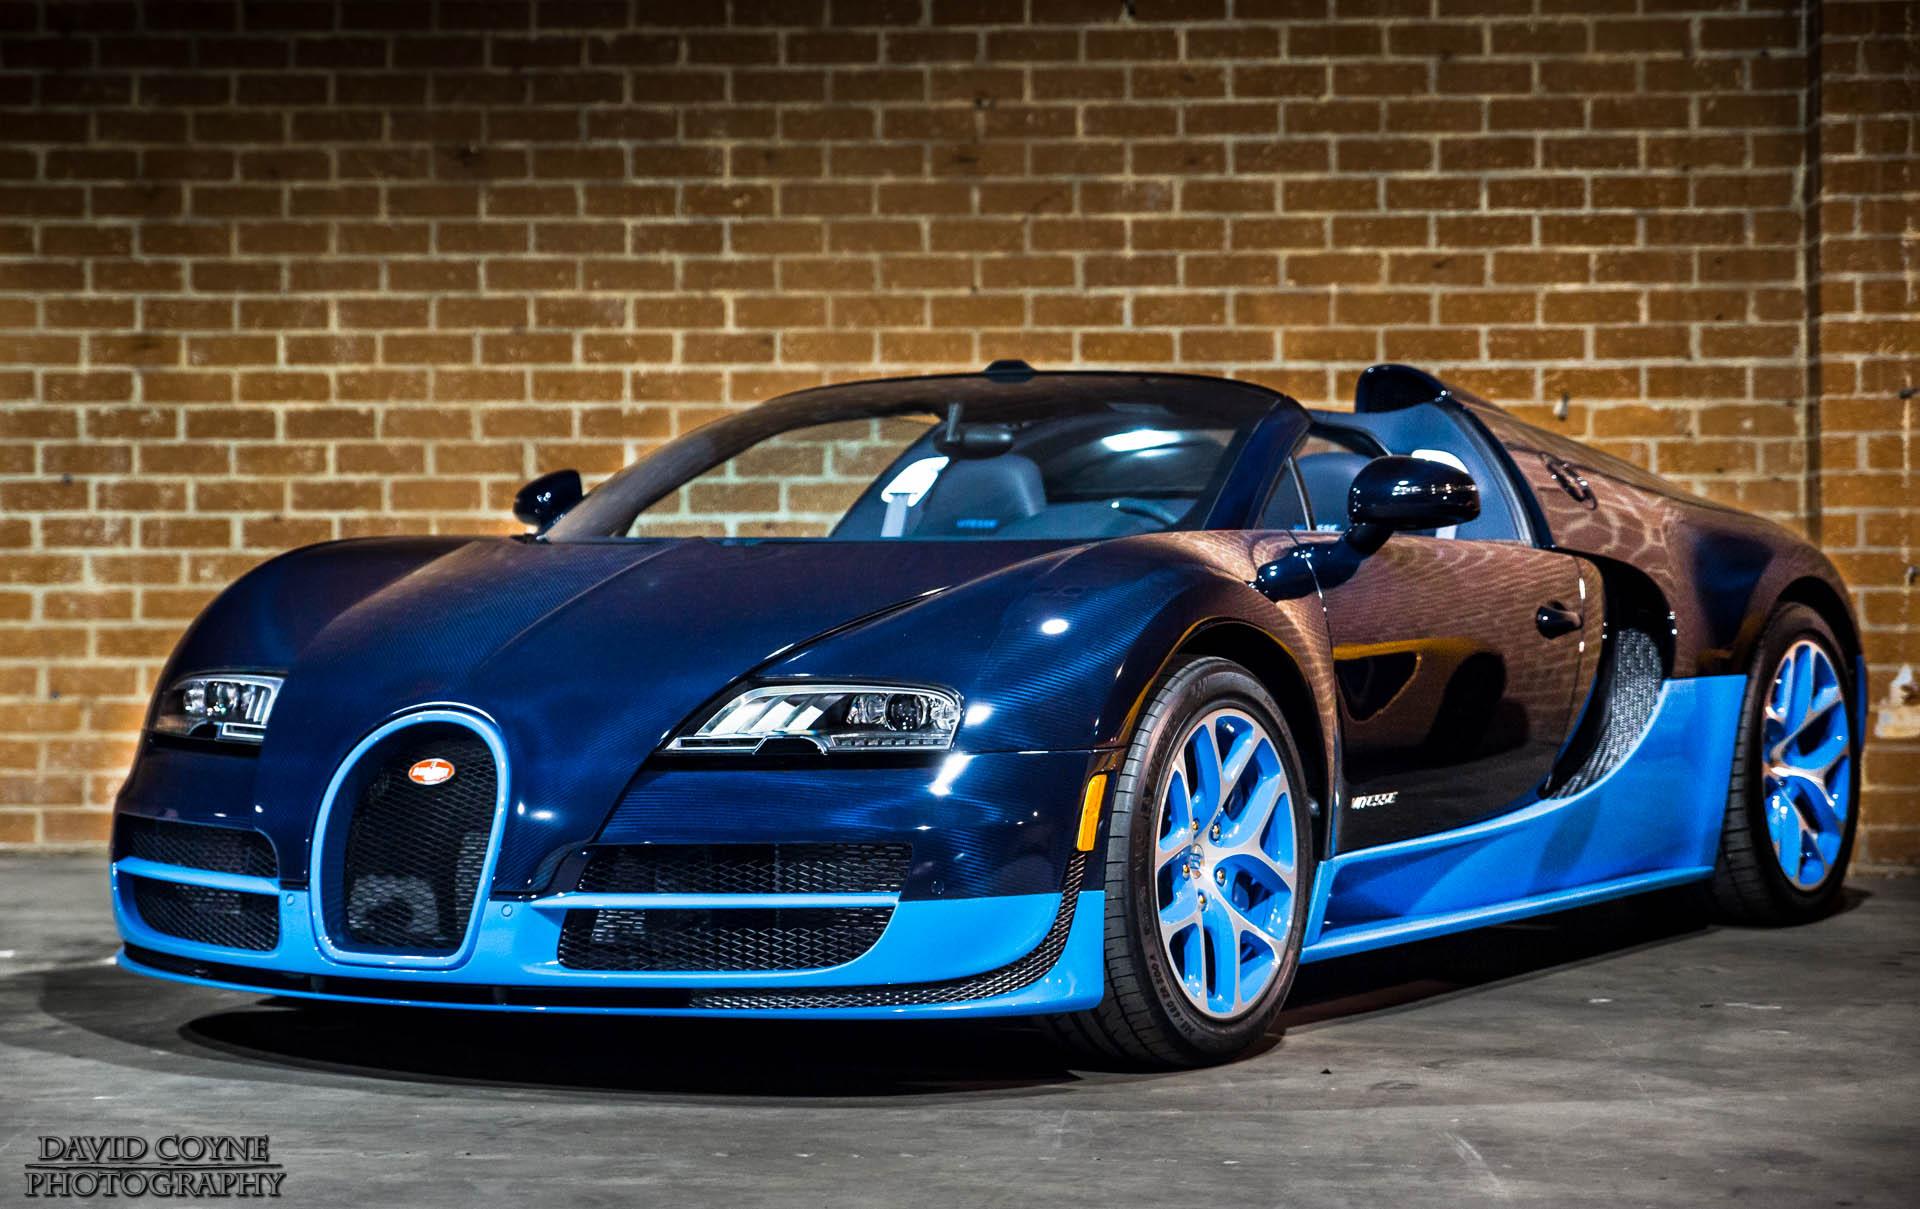 Wallpaper Supercars Blue Canon California Sports Car Bugatti Veyron Performance Car Hypercar C Rare Flickr Cars Amazing Auto Tumblr Automobile Rim Series Supercar Cali Socal Canoneos5dmarkiii Vitesse Veyron Automotivated